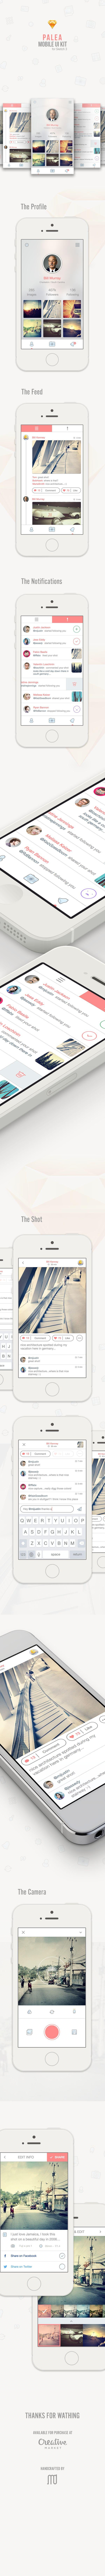 Palea Mobile UI Kit for Sketch#ui #ux #mobile #design #app